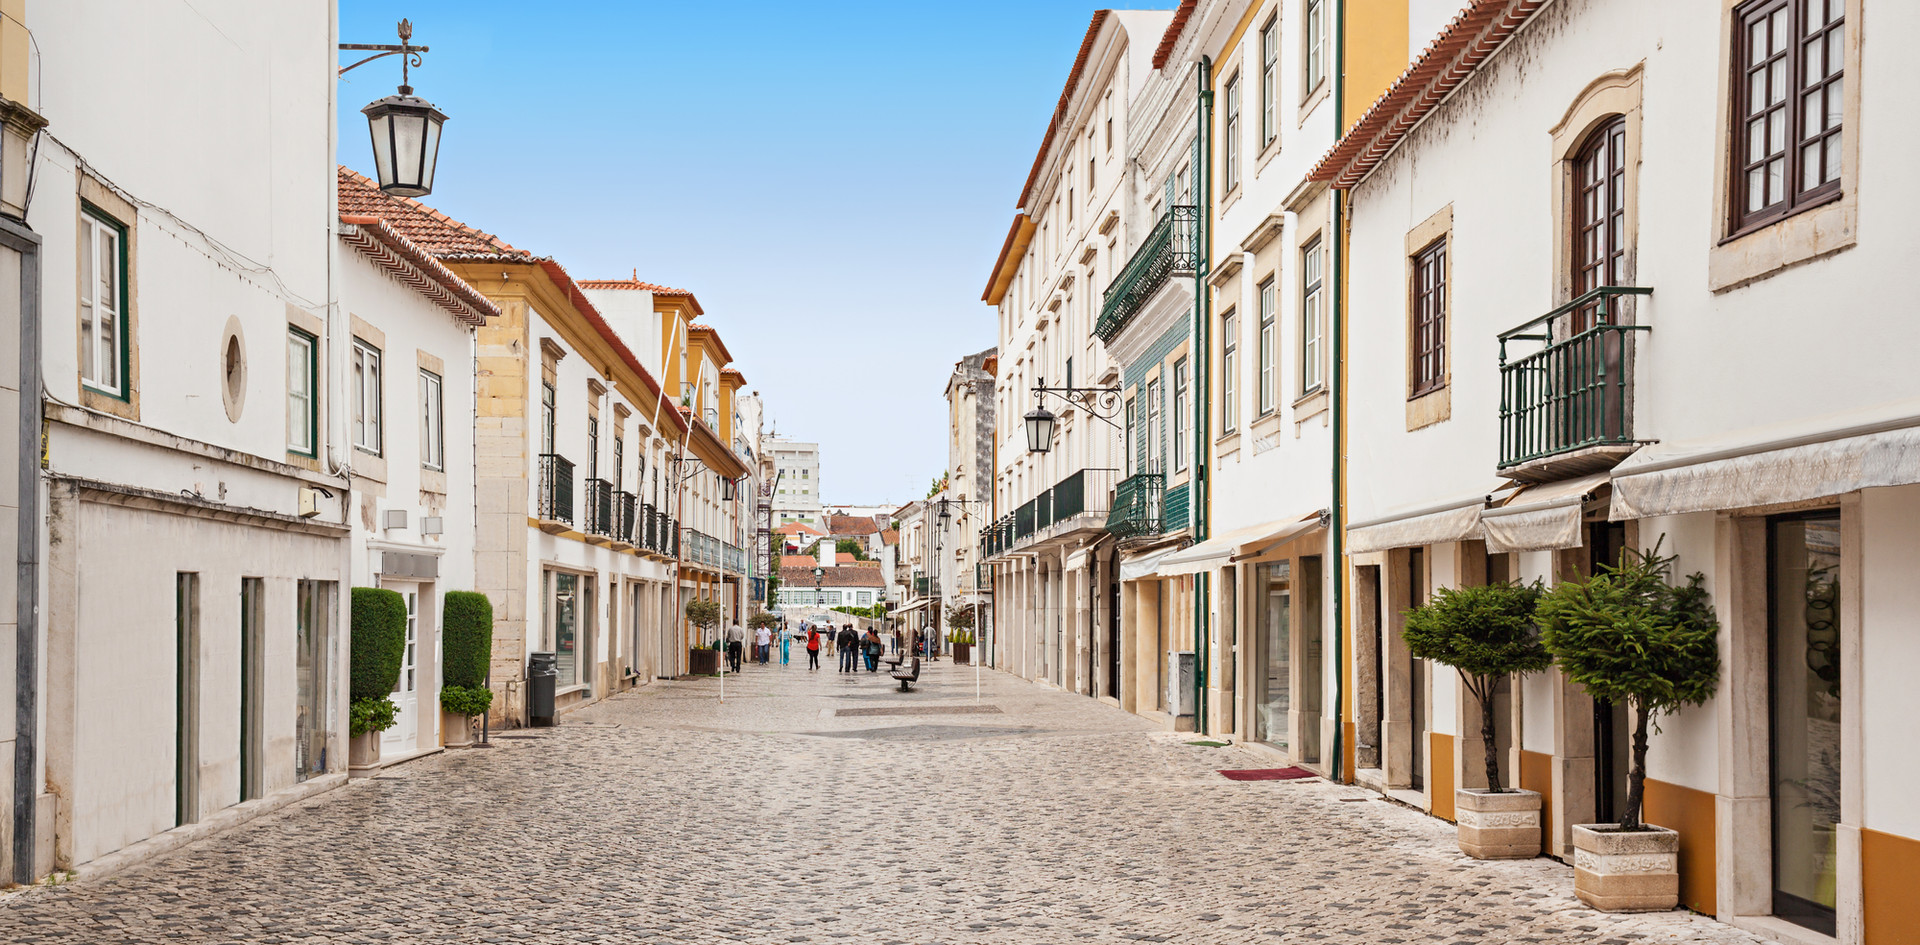 Tomar city center, Santarem District in